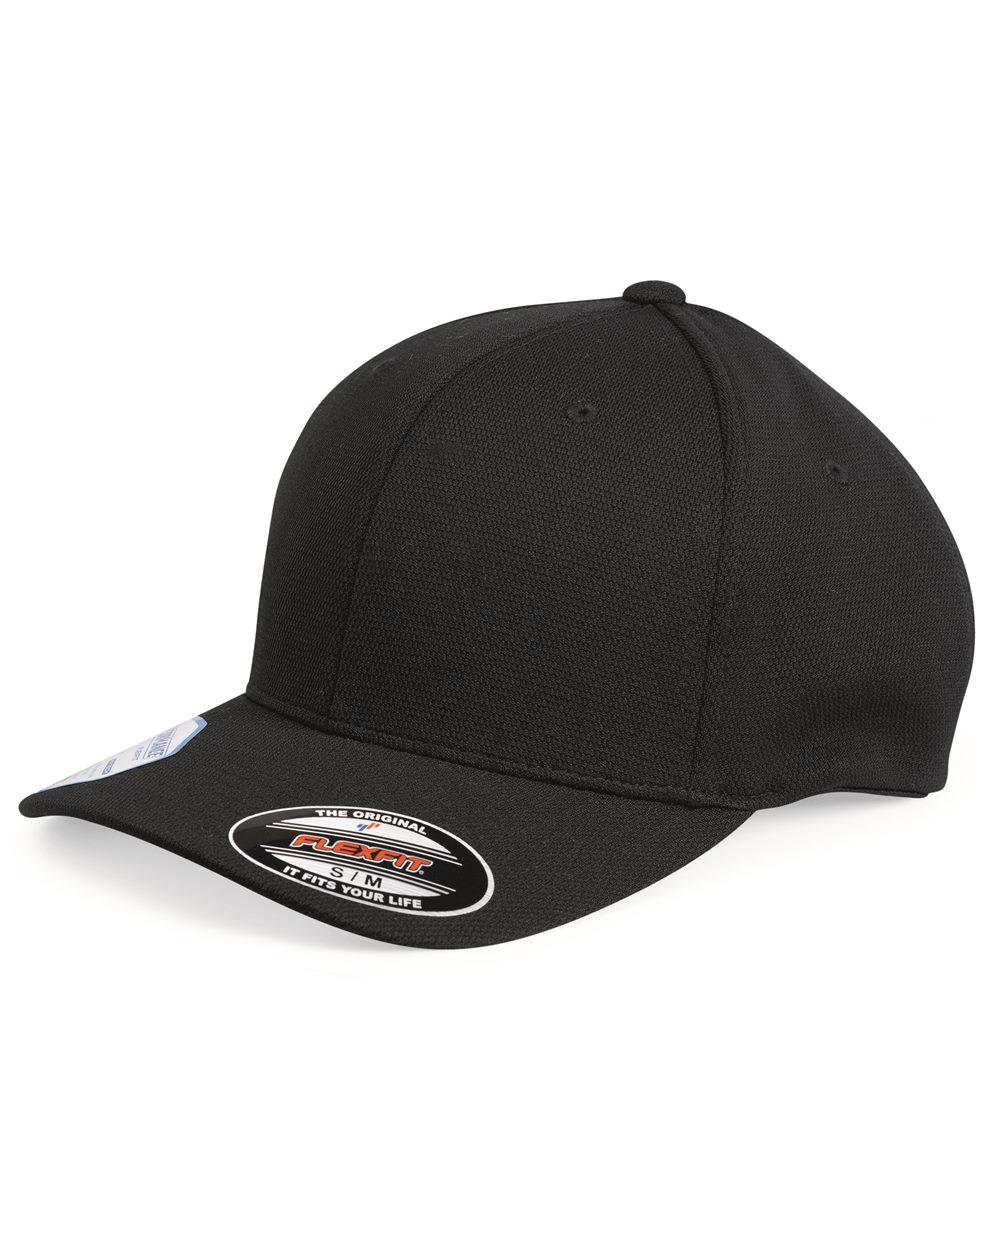 Flexfit 6597 - Cool & Dry Sport Cap